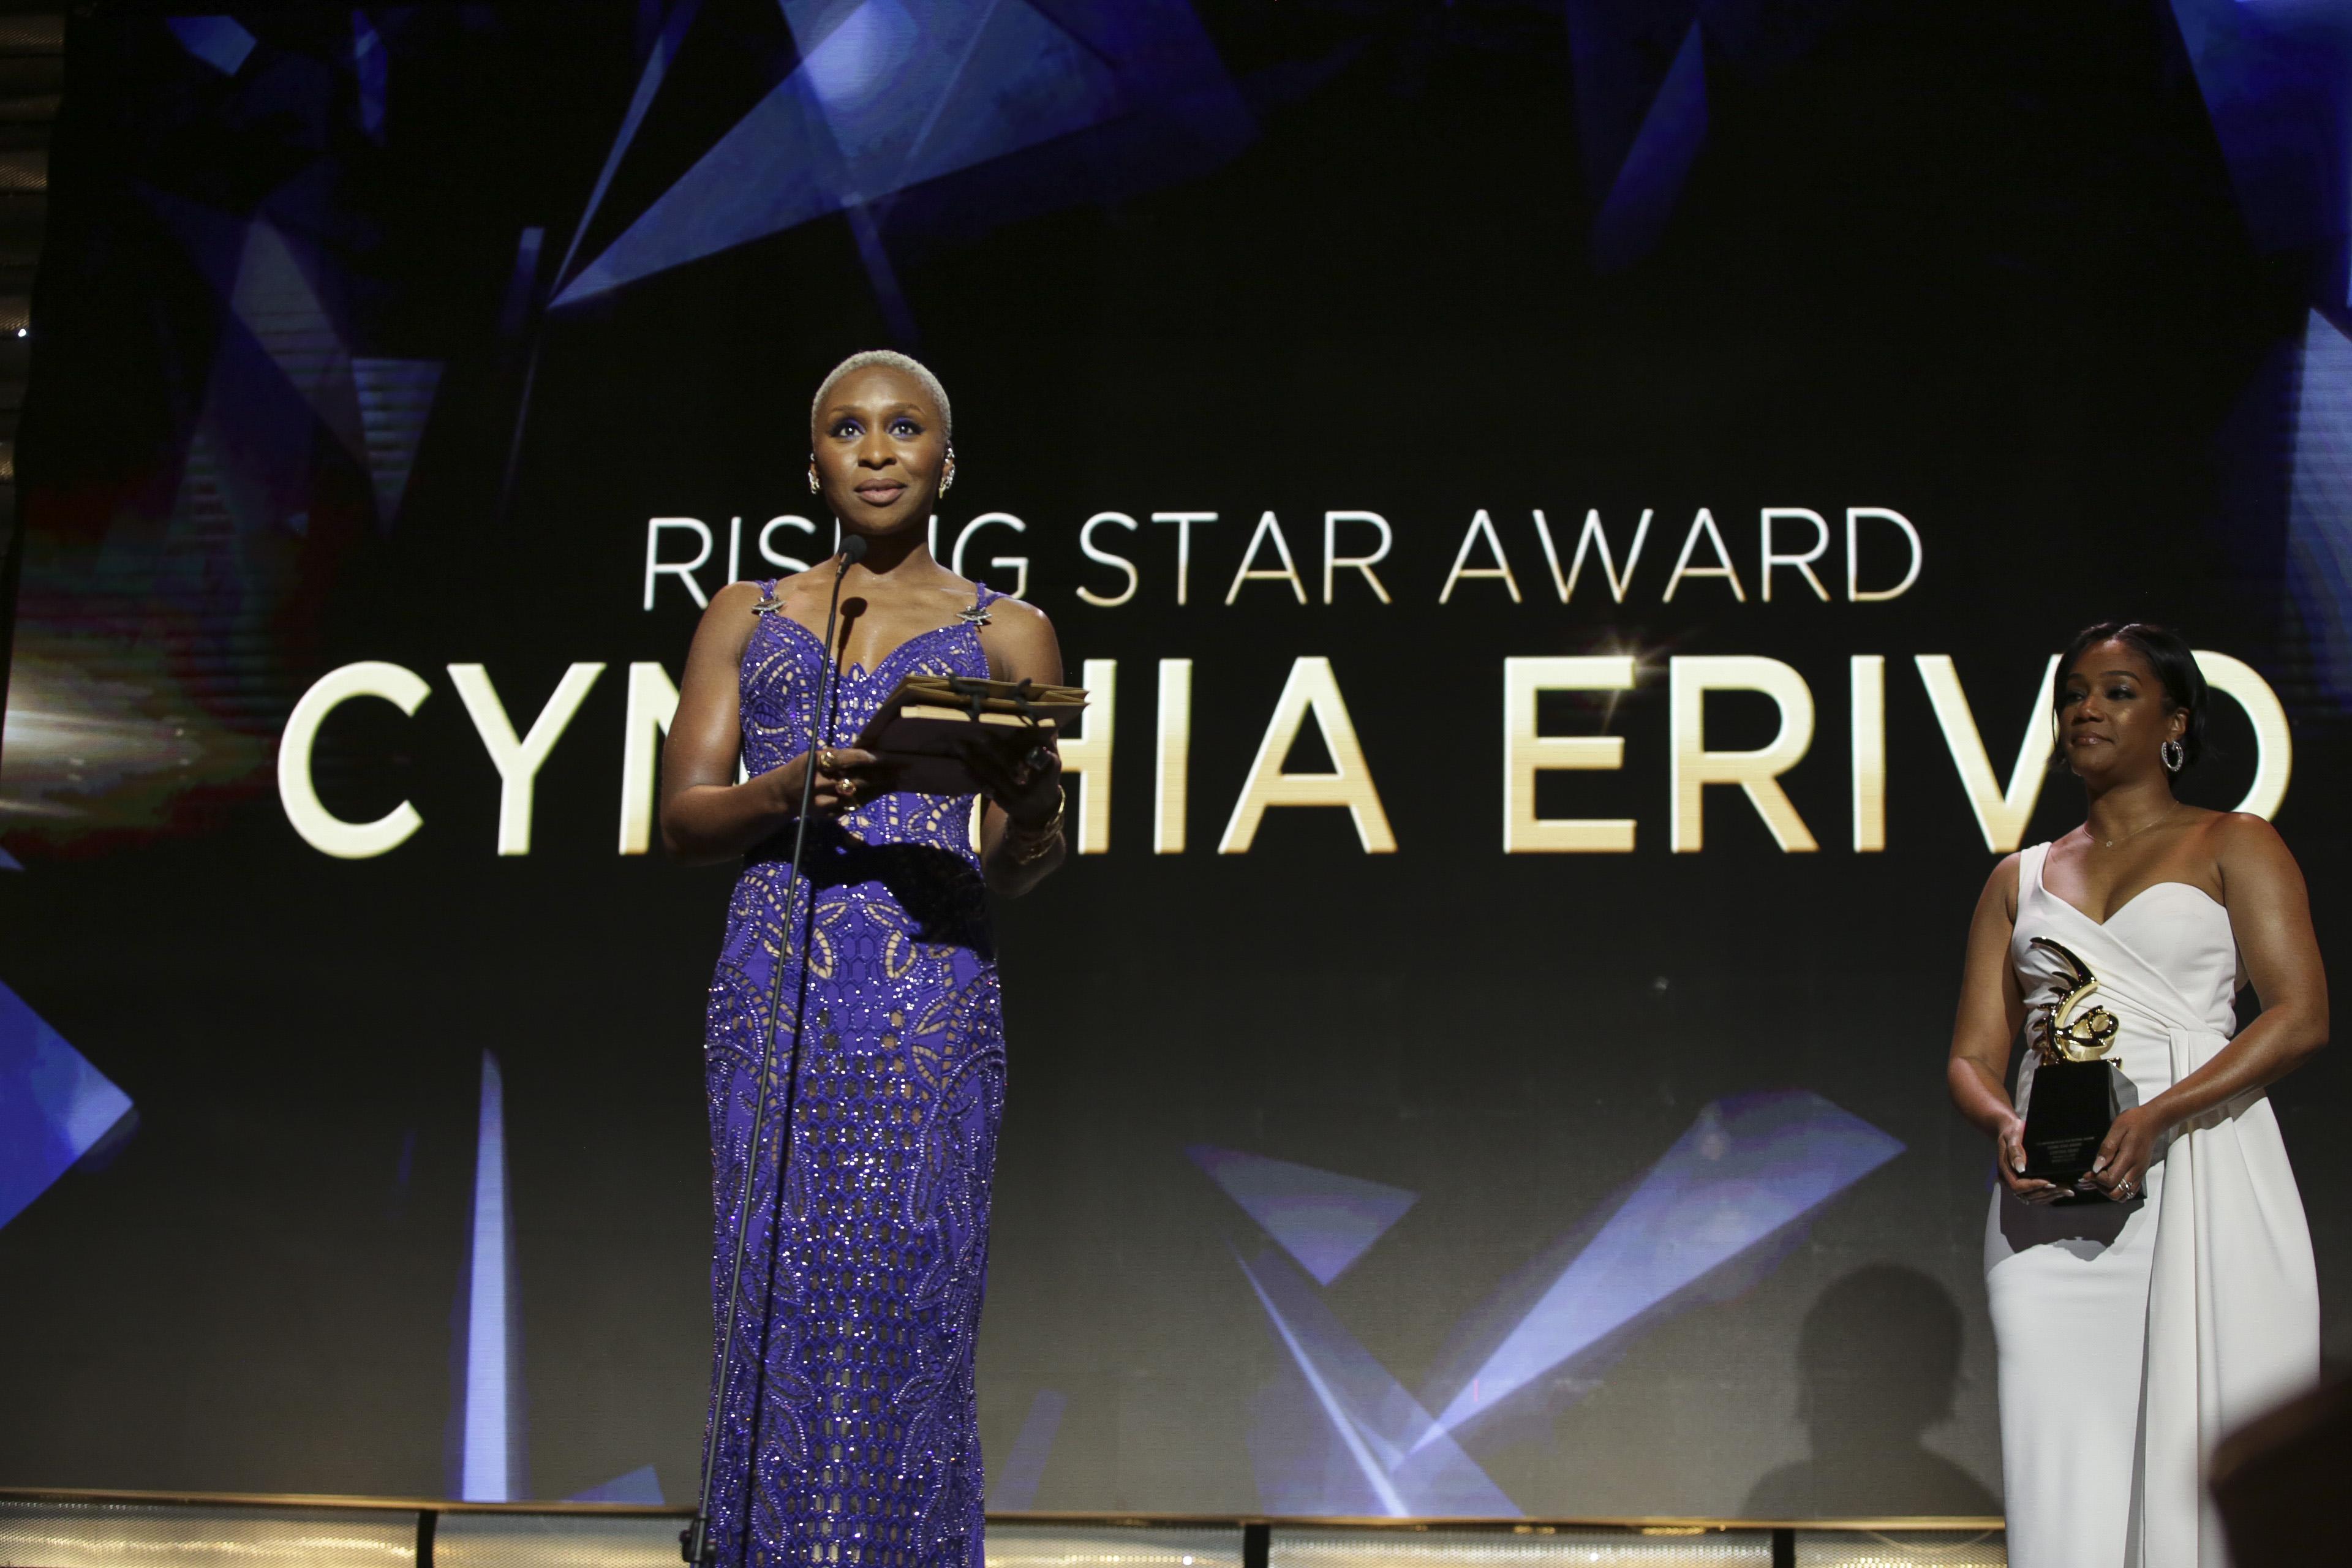 Cynthia Erivo and Tiffany Haddish 4th Annual American Black Film Festival Honors Awards